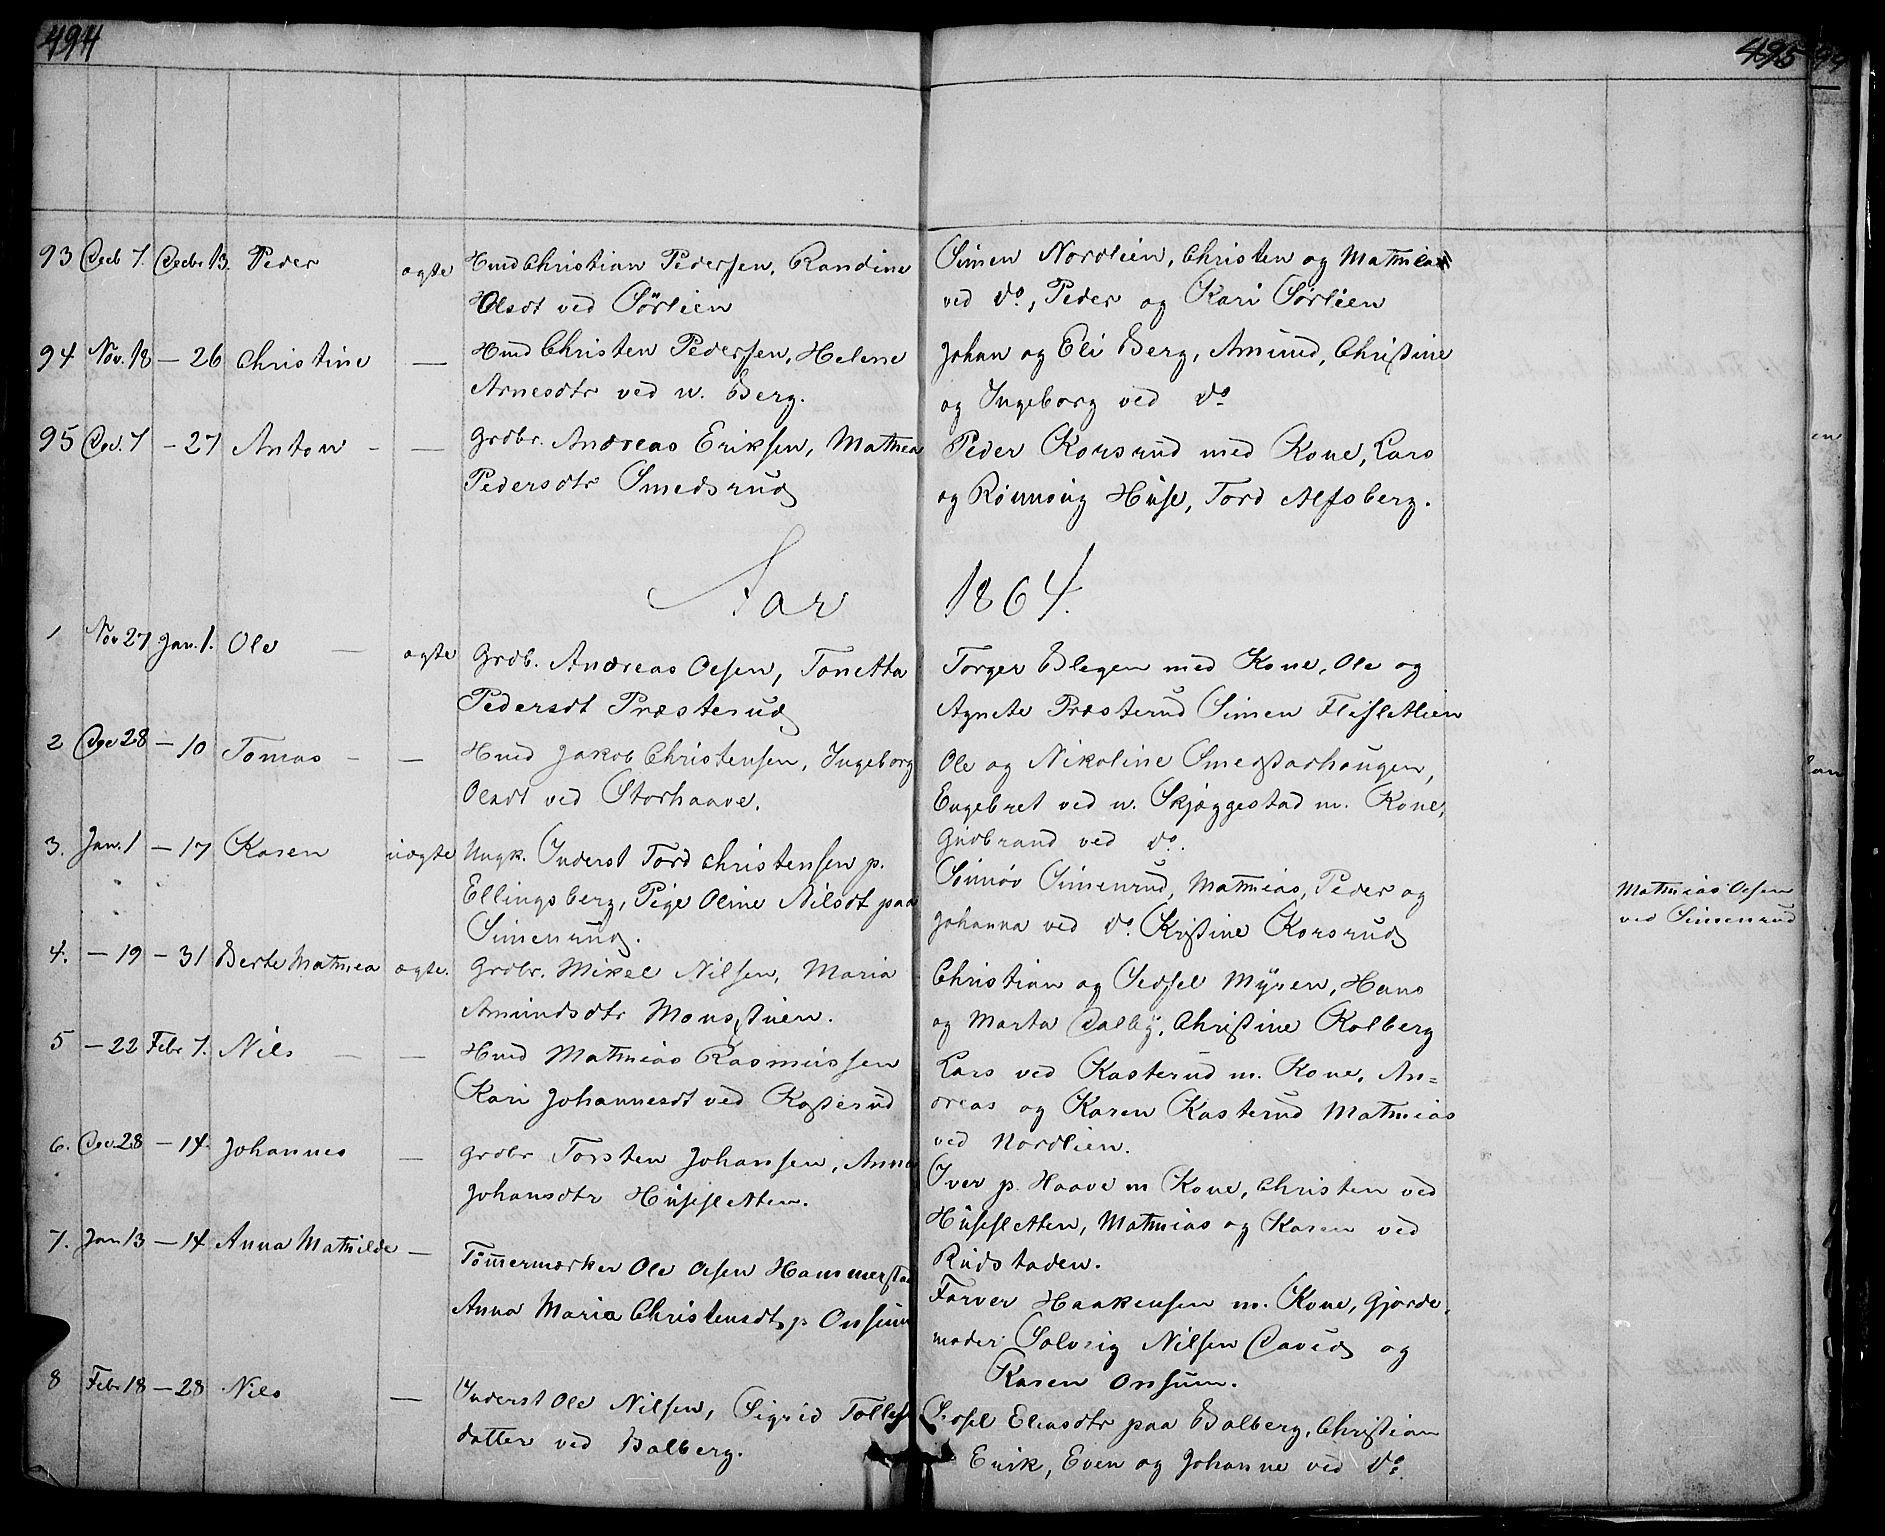 SAH, Fåberg prestekontor, H/Ha/Hab/L0005: Klokkerbok nr. 5, 1837-1864, s. 494-495